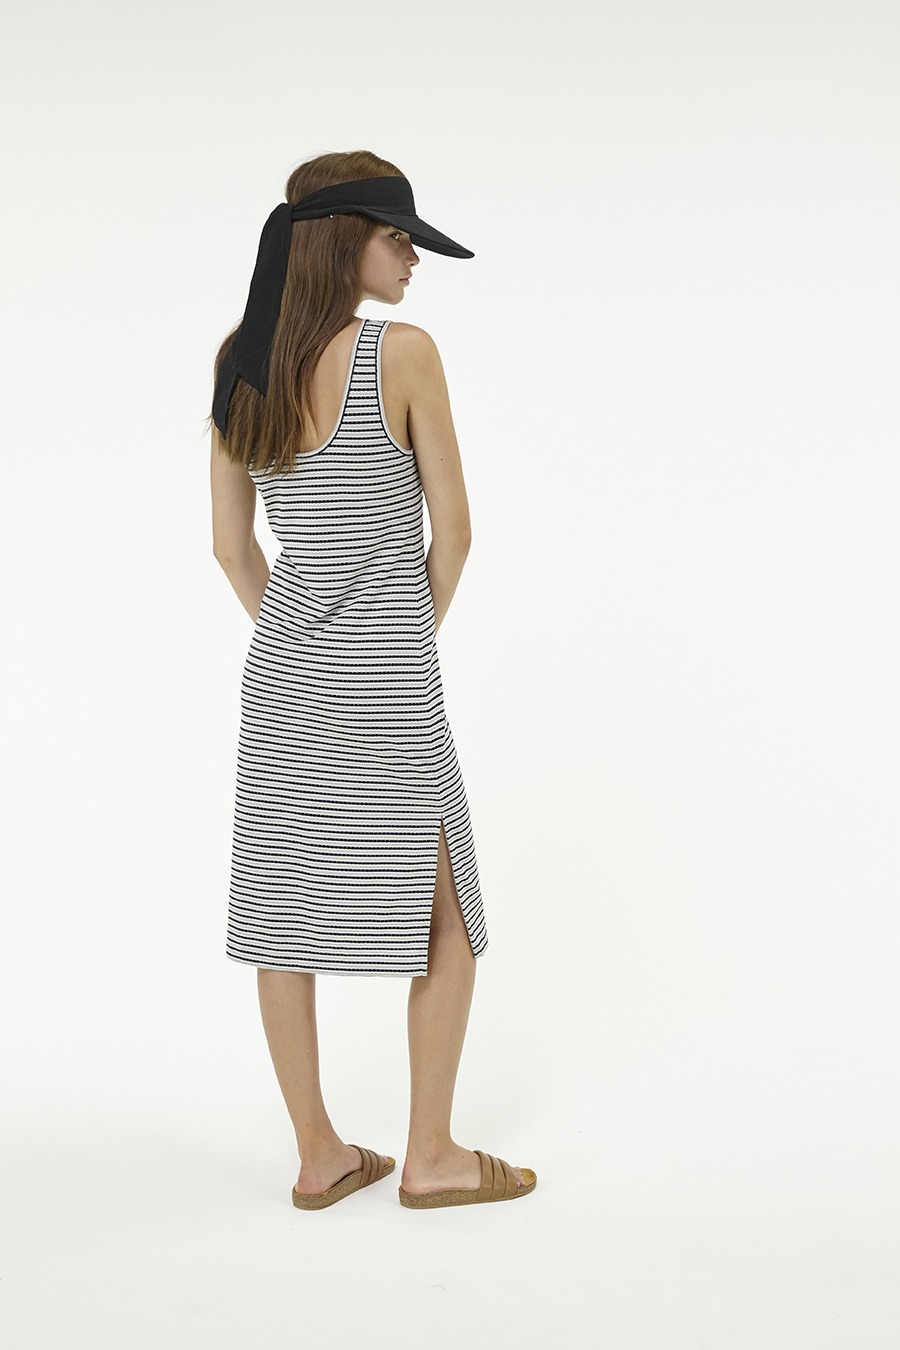 Huffer_Q3-16_W-Railway-Plaza-Dress_Black-Grey-05